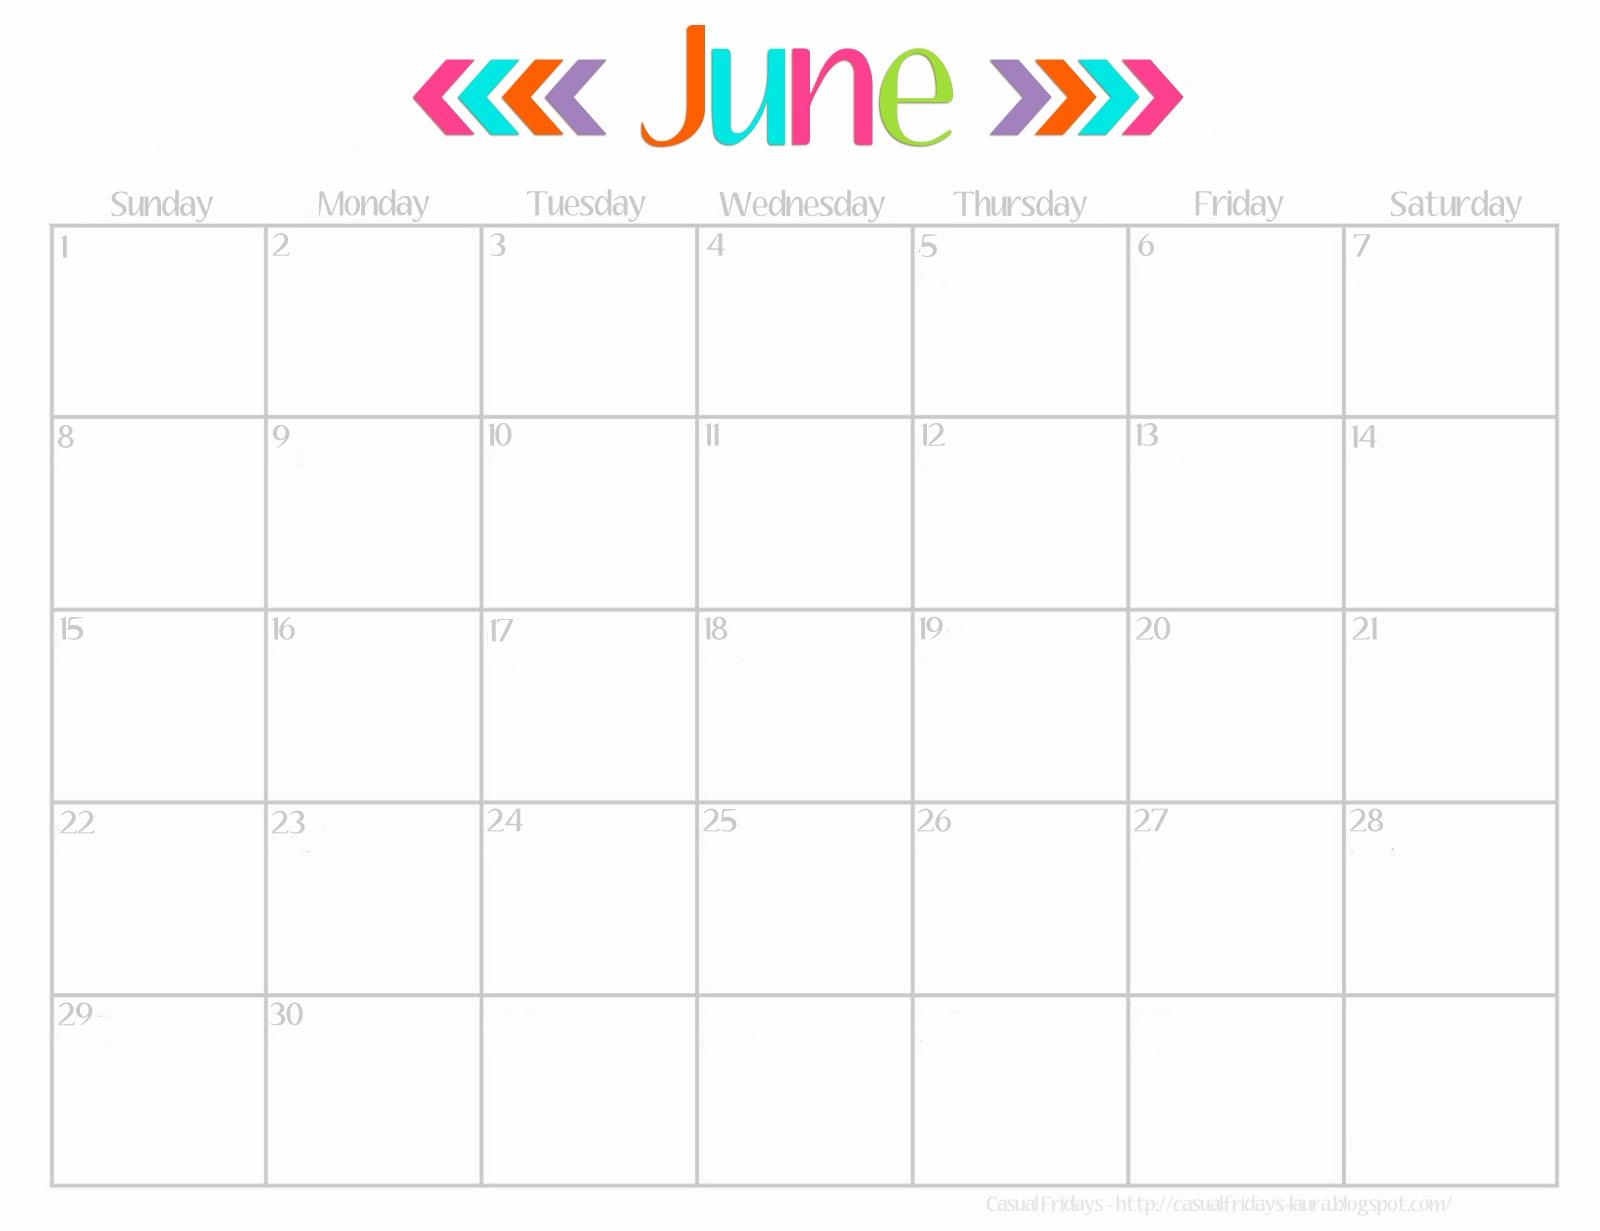 Doc871674 Word Template Calendar 2015 Word Calendar Template – Word Template Calendar 2015